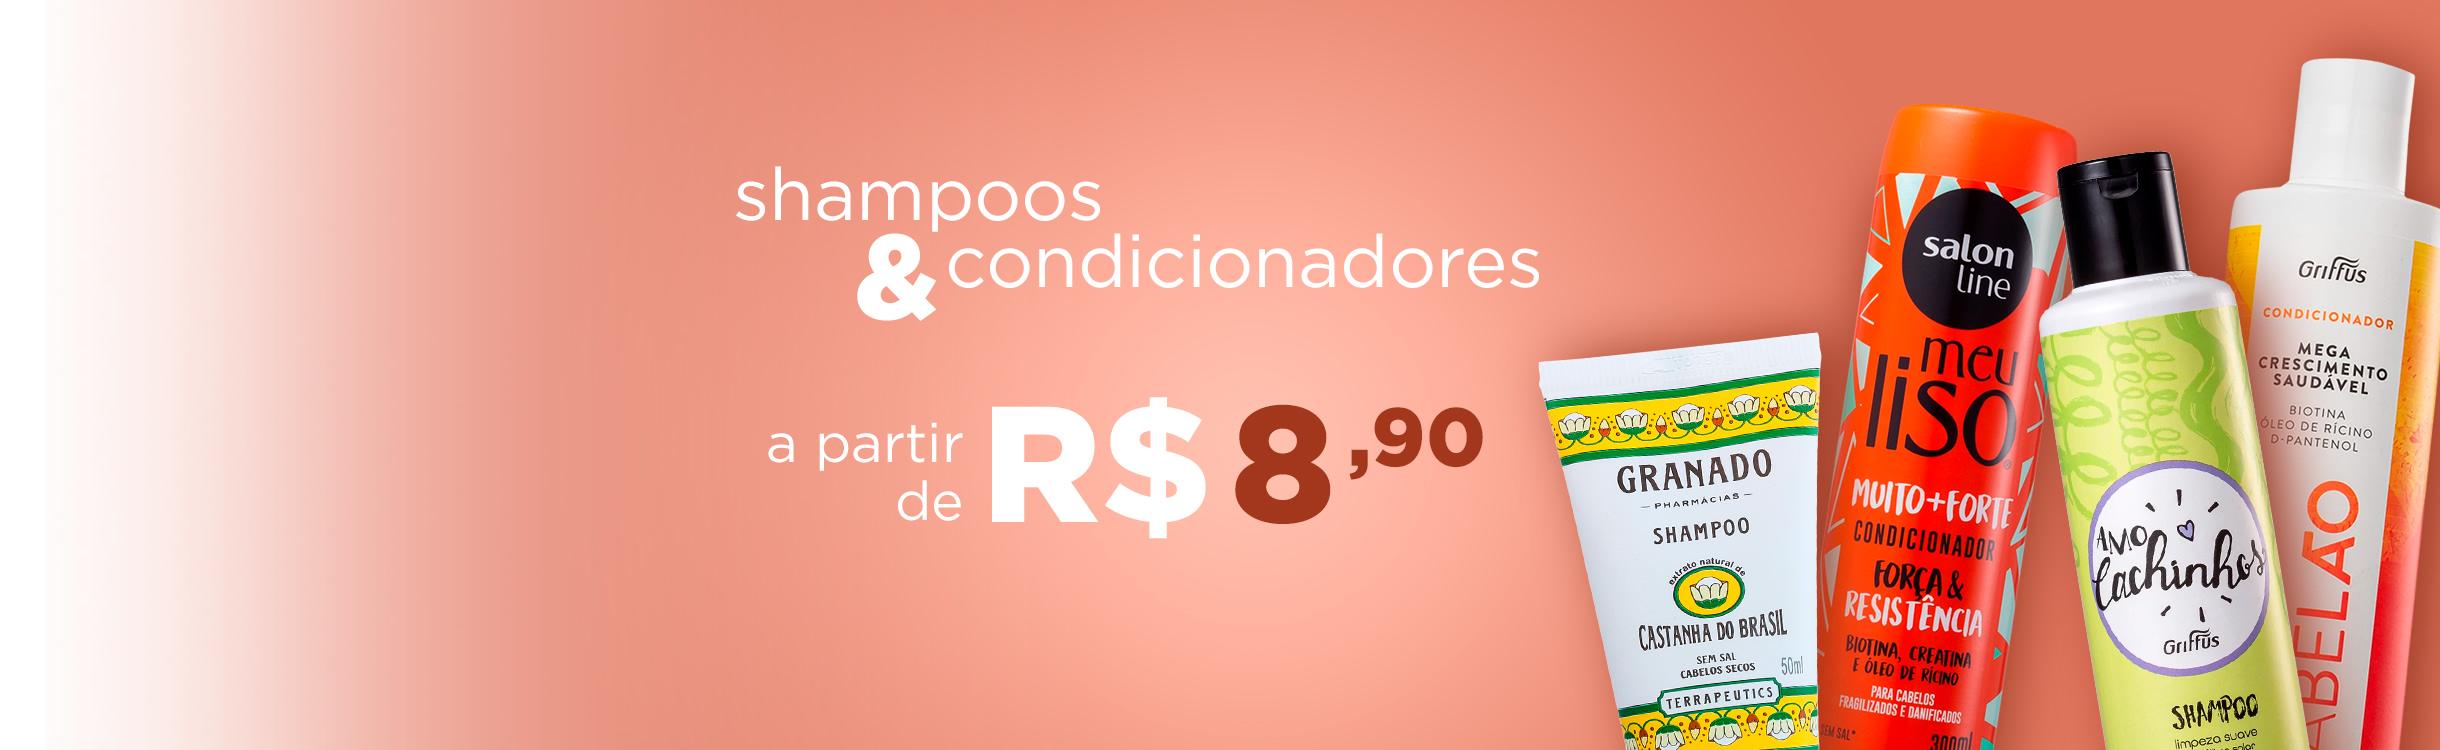 Shampoos e Condicionadores a partir de R$8,90